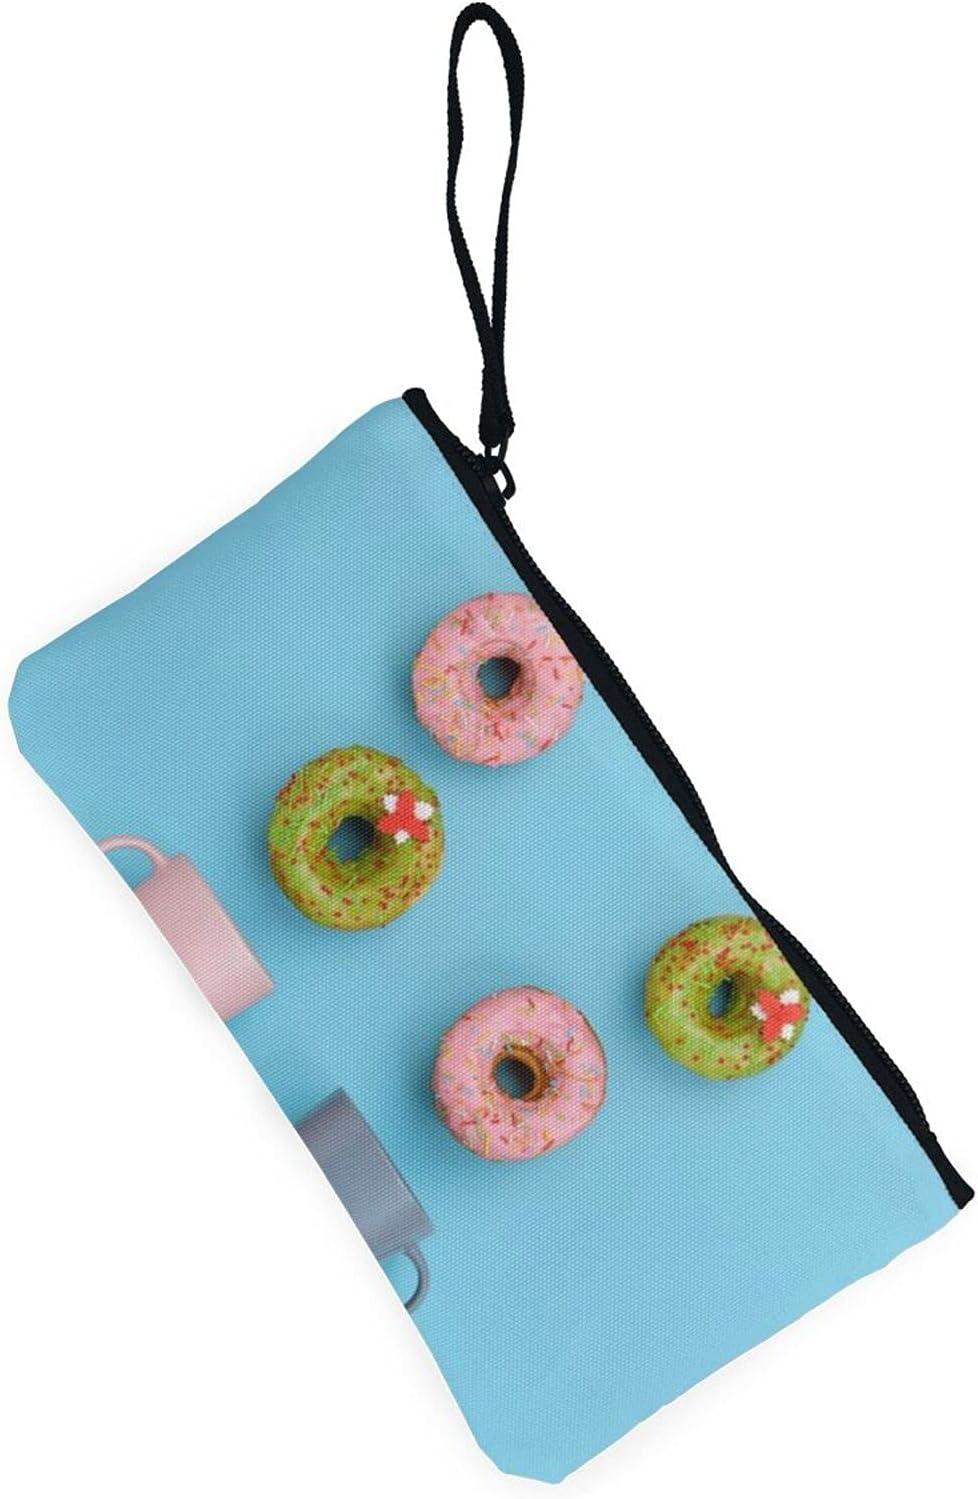 AORRUAM Mugs And Sweet Donuts Canvas Coin Purse,Canvas Zipper Pencil Cases,Canvas Change Purse Pouch Mini Wallet Coin Bag